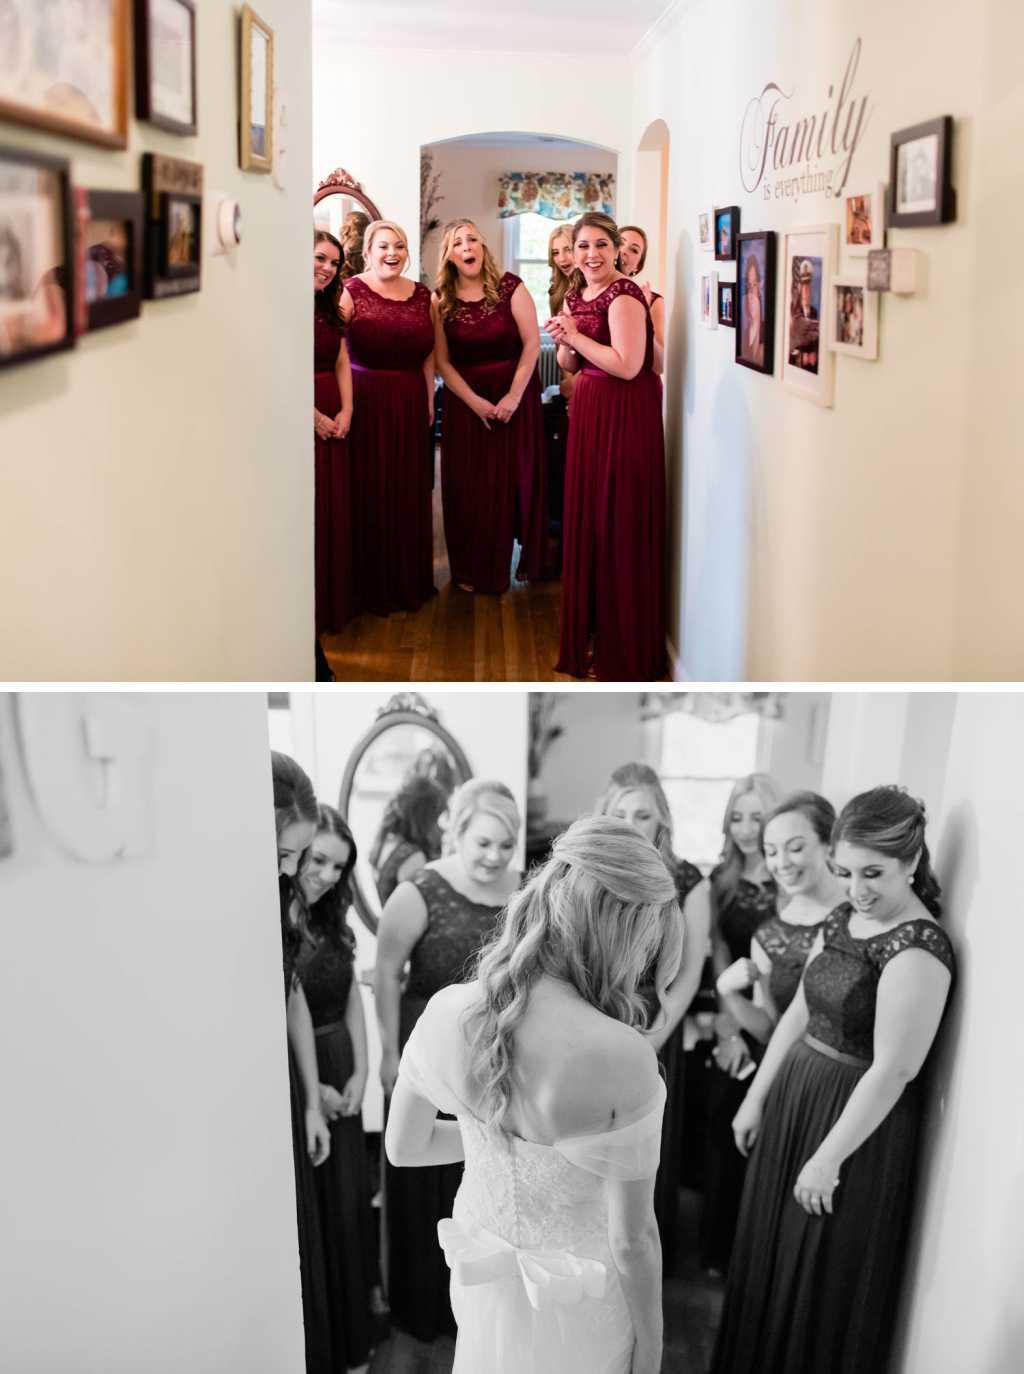 Bride getting ready photos by Casey Fatchett - https://fatchett.com